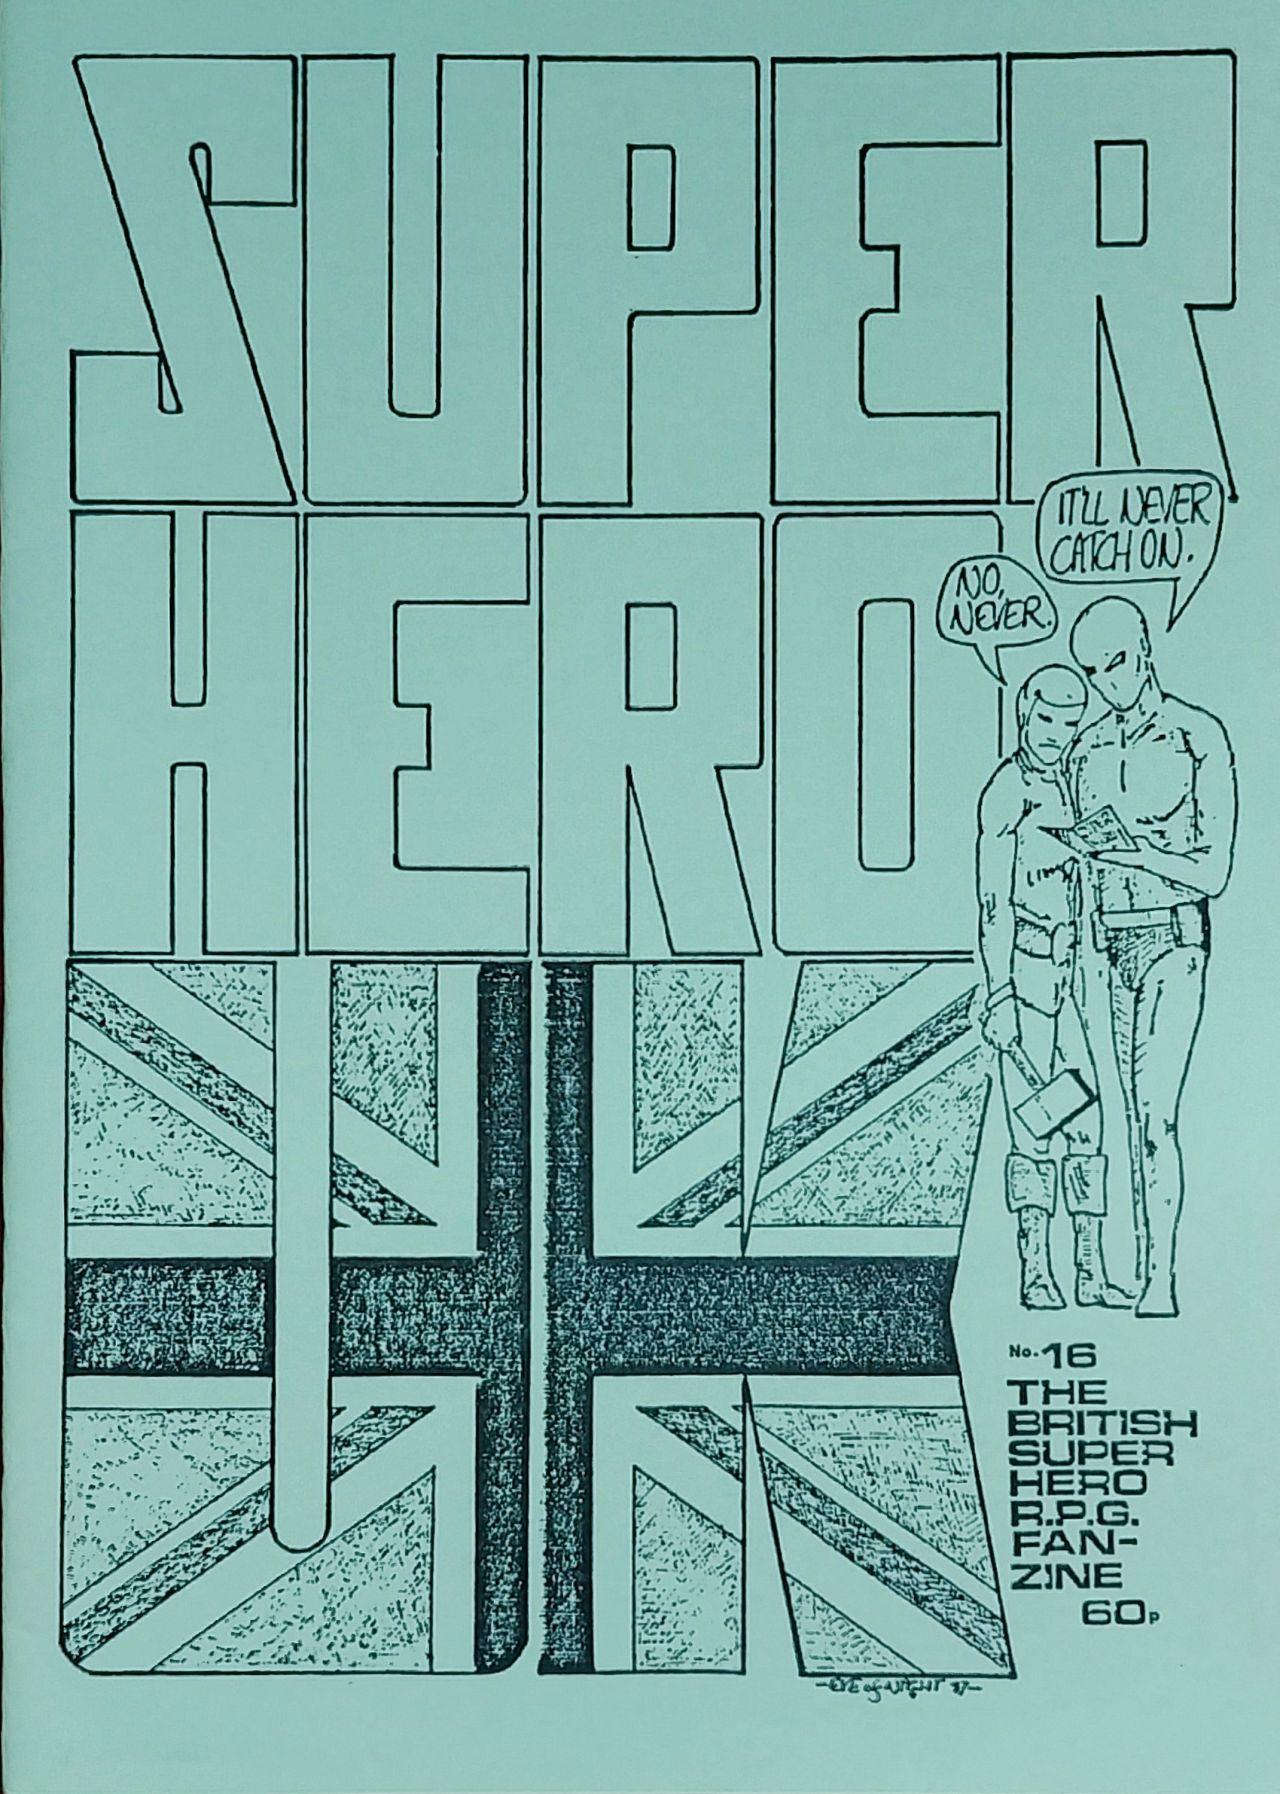 Superhero UK 16.jpg